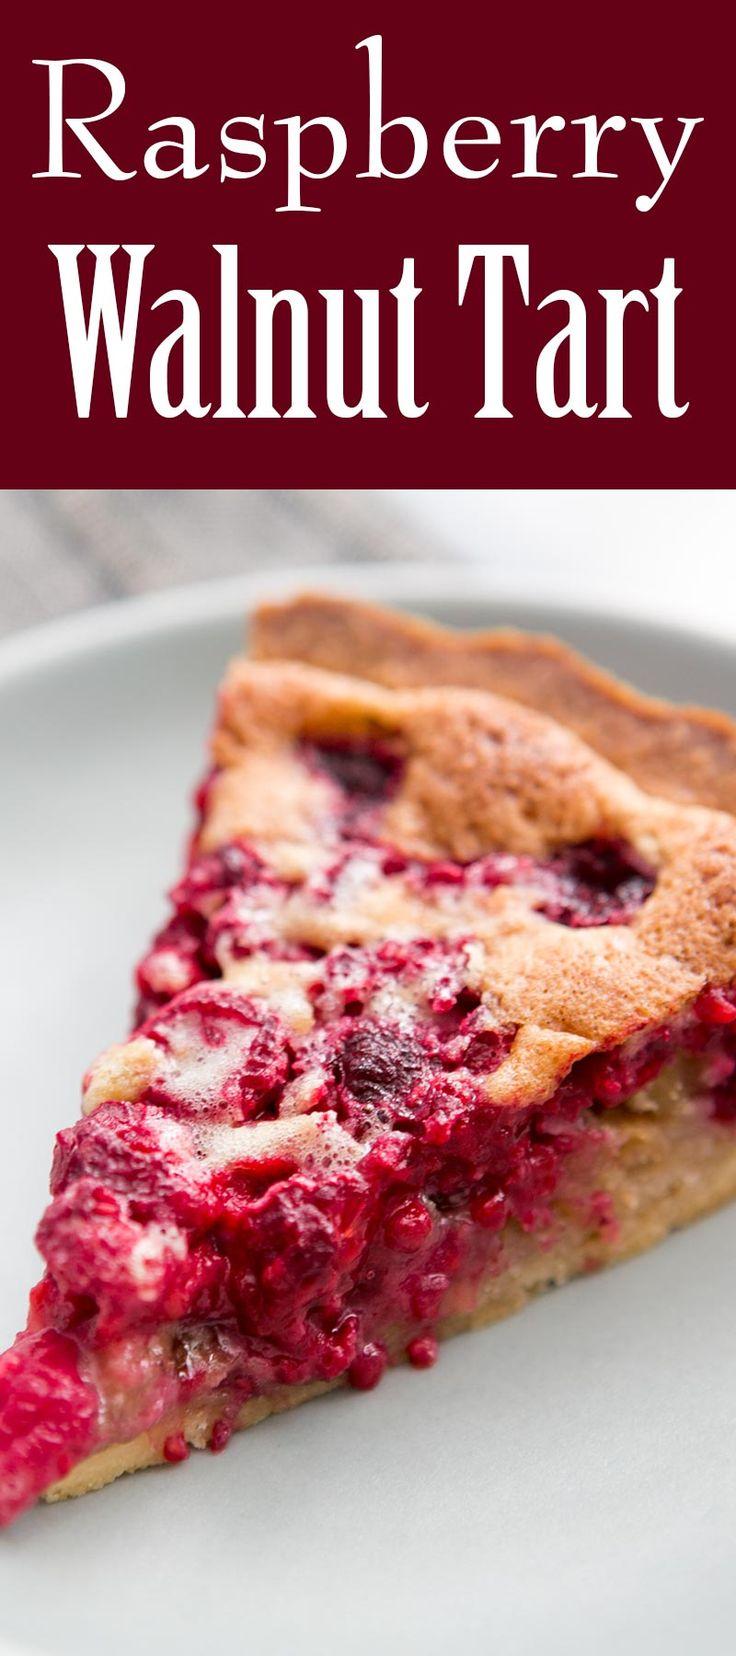 this raspberry walnut tart! with a shortbread crust, chopped walnuts ...